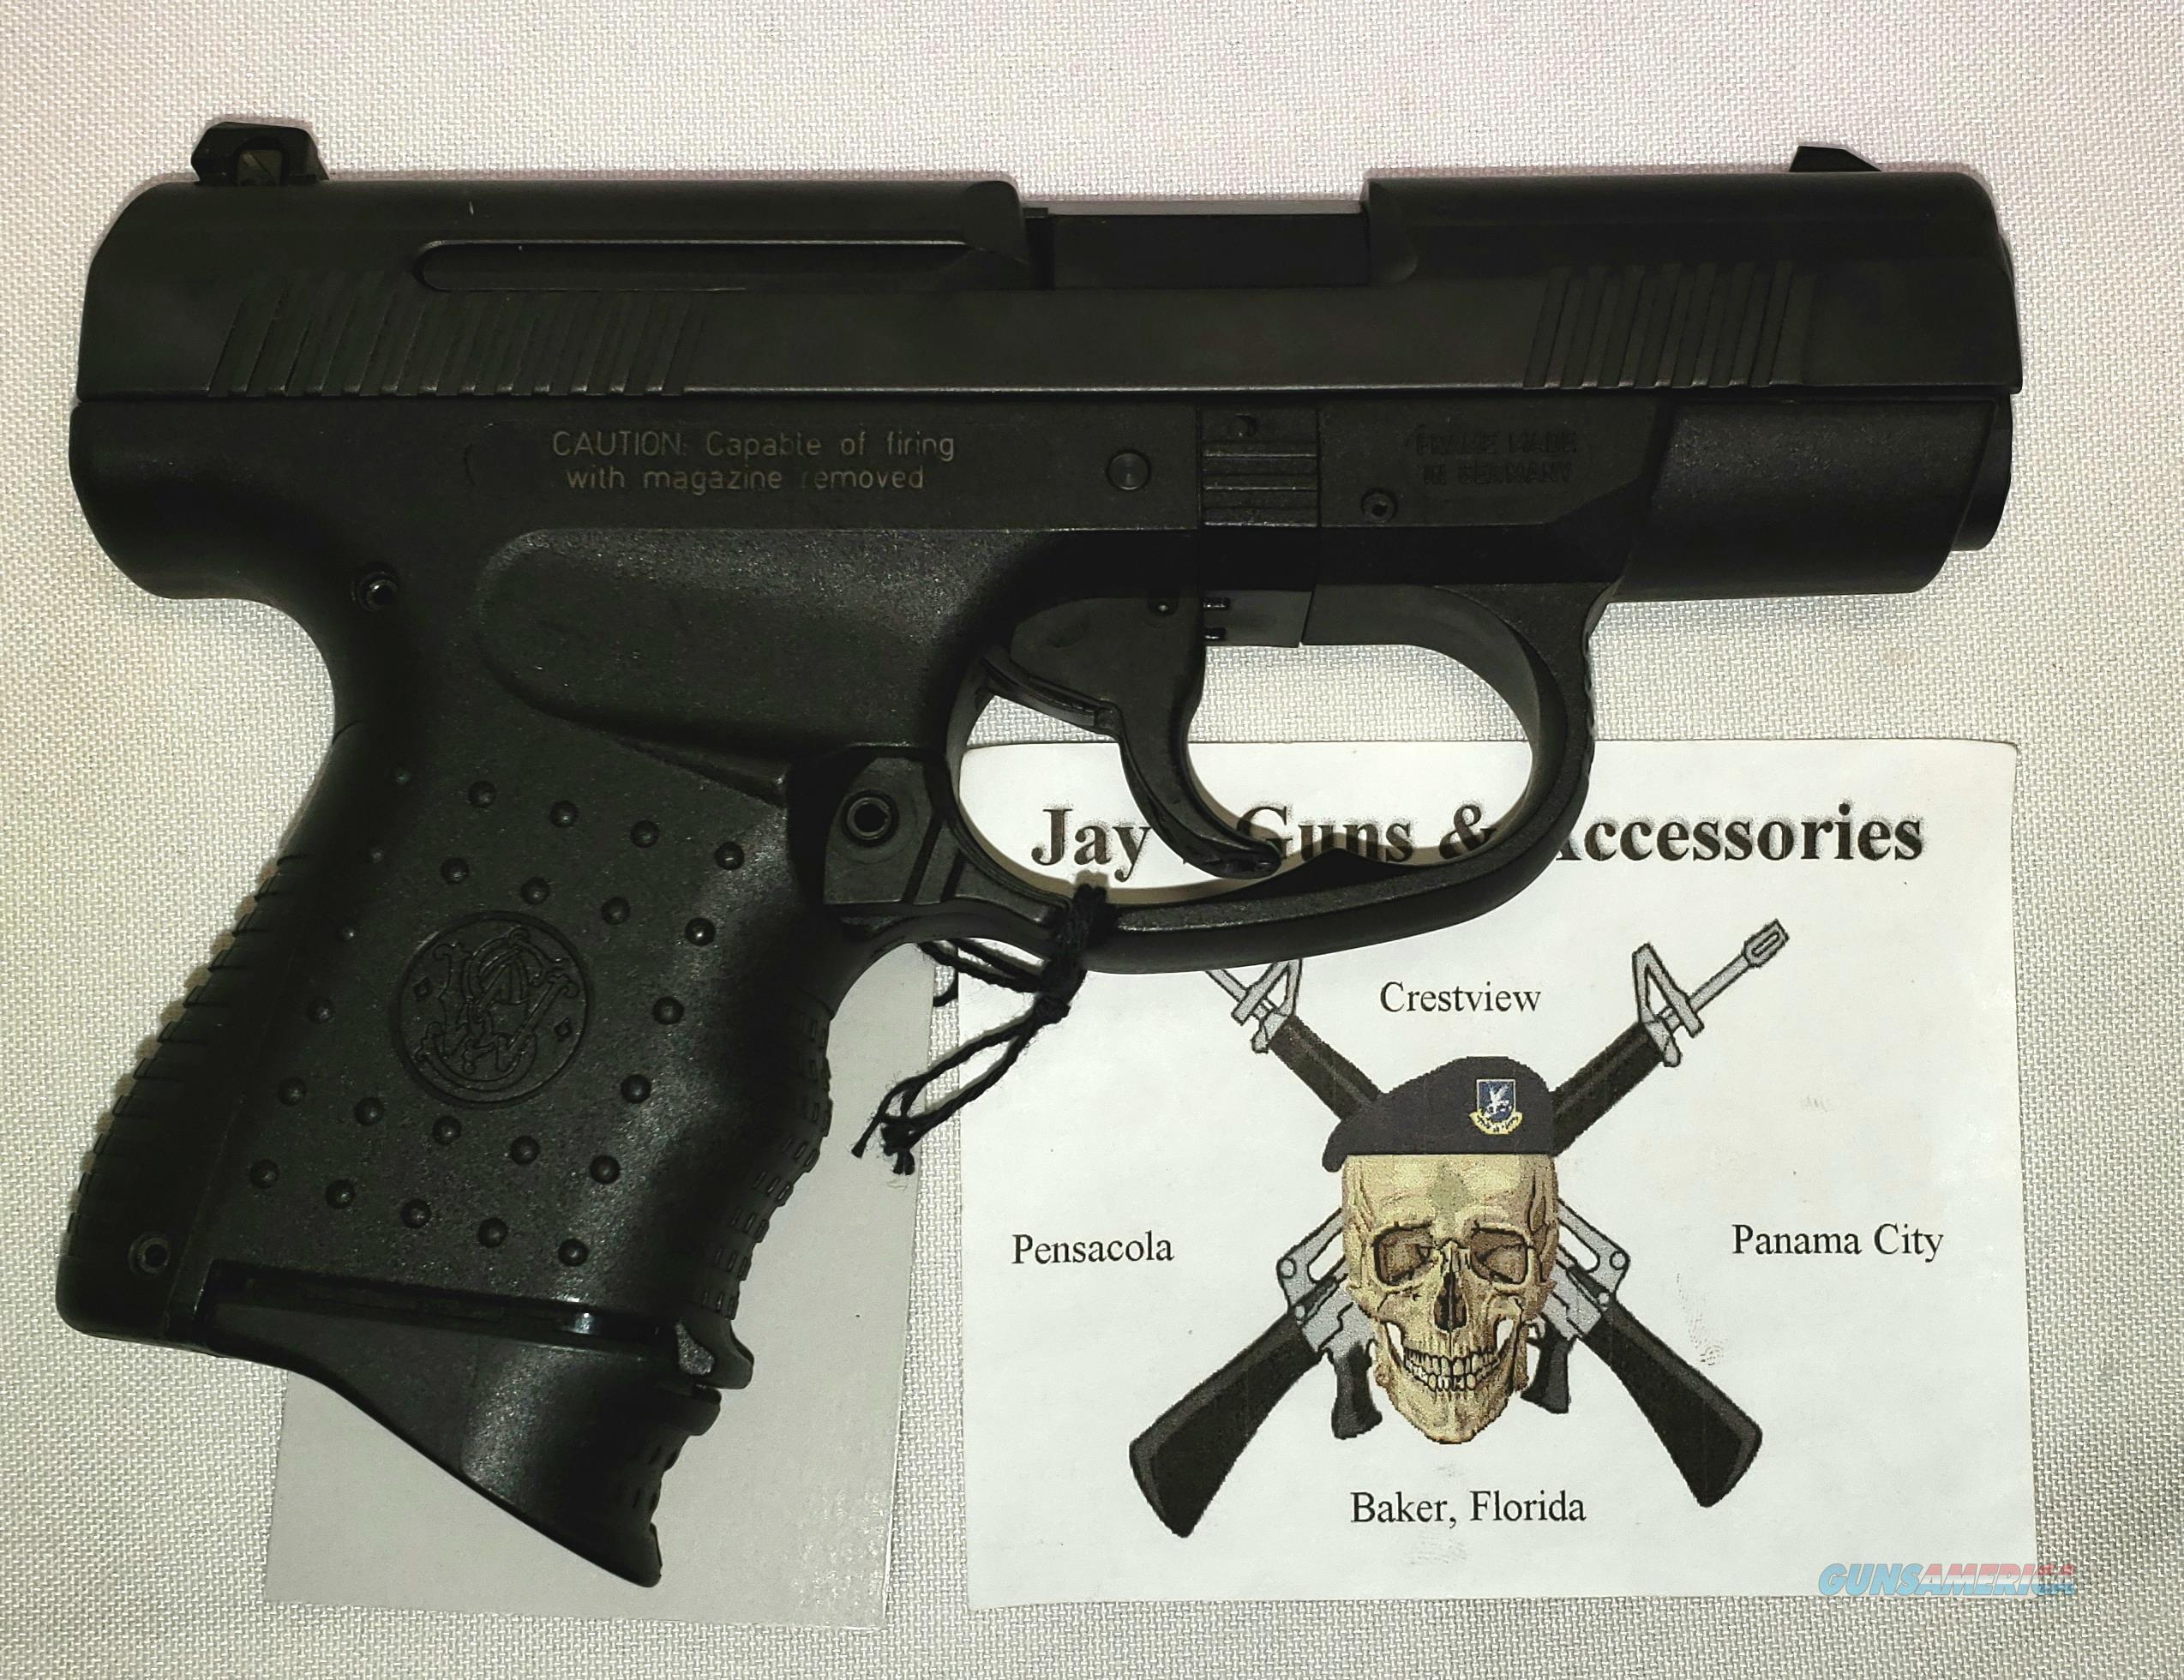 Smith & Wesson SW990L  Guns > Pistols > Smith & Wesson Pistols - Autos > Alloy Frame